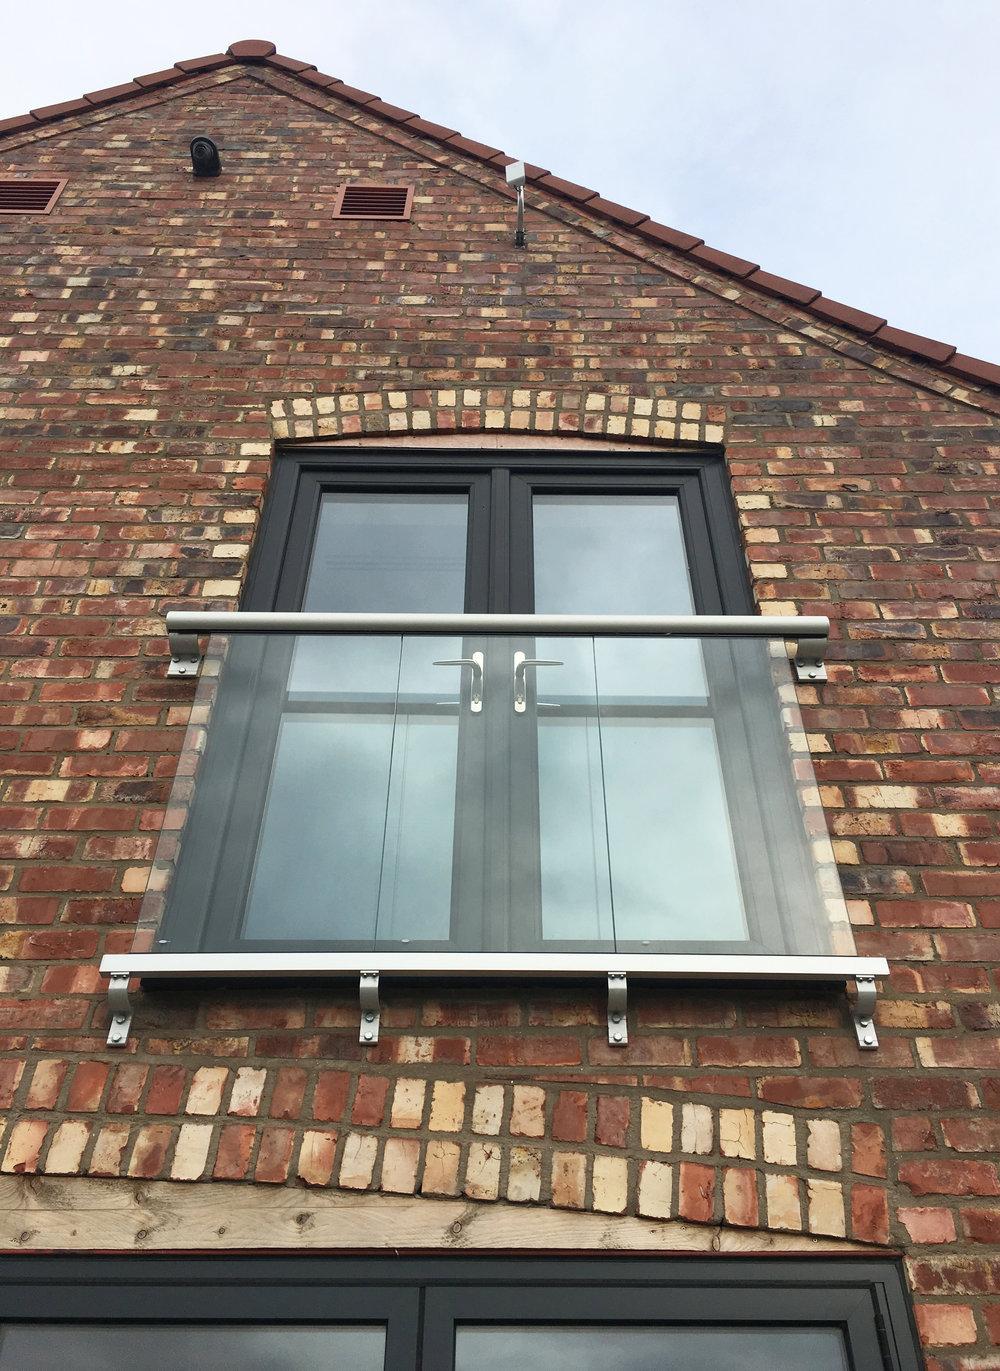 Lelley Farmhouse 9 - East Yorkshire Architects - Samuel Kendall Associates.jpg